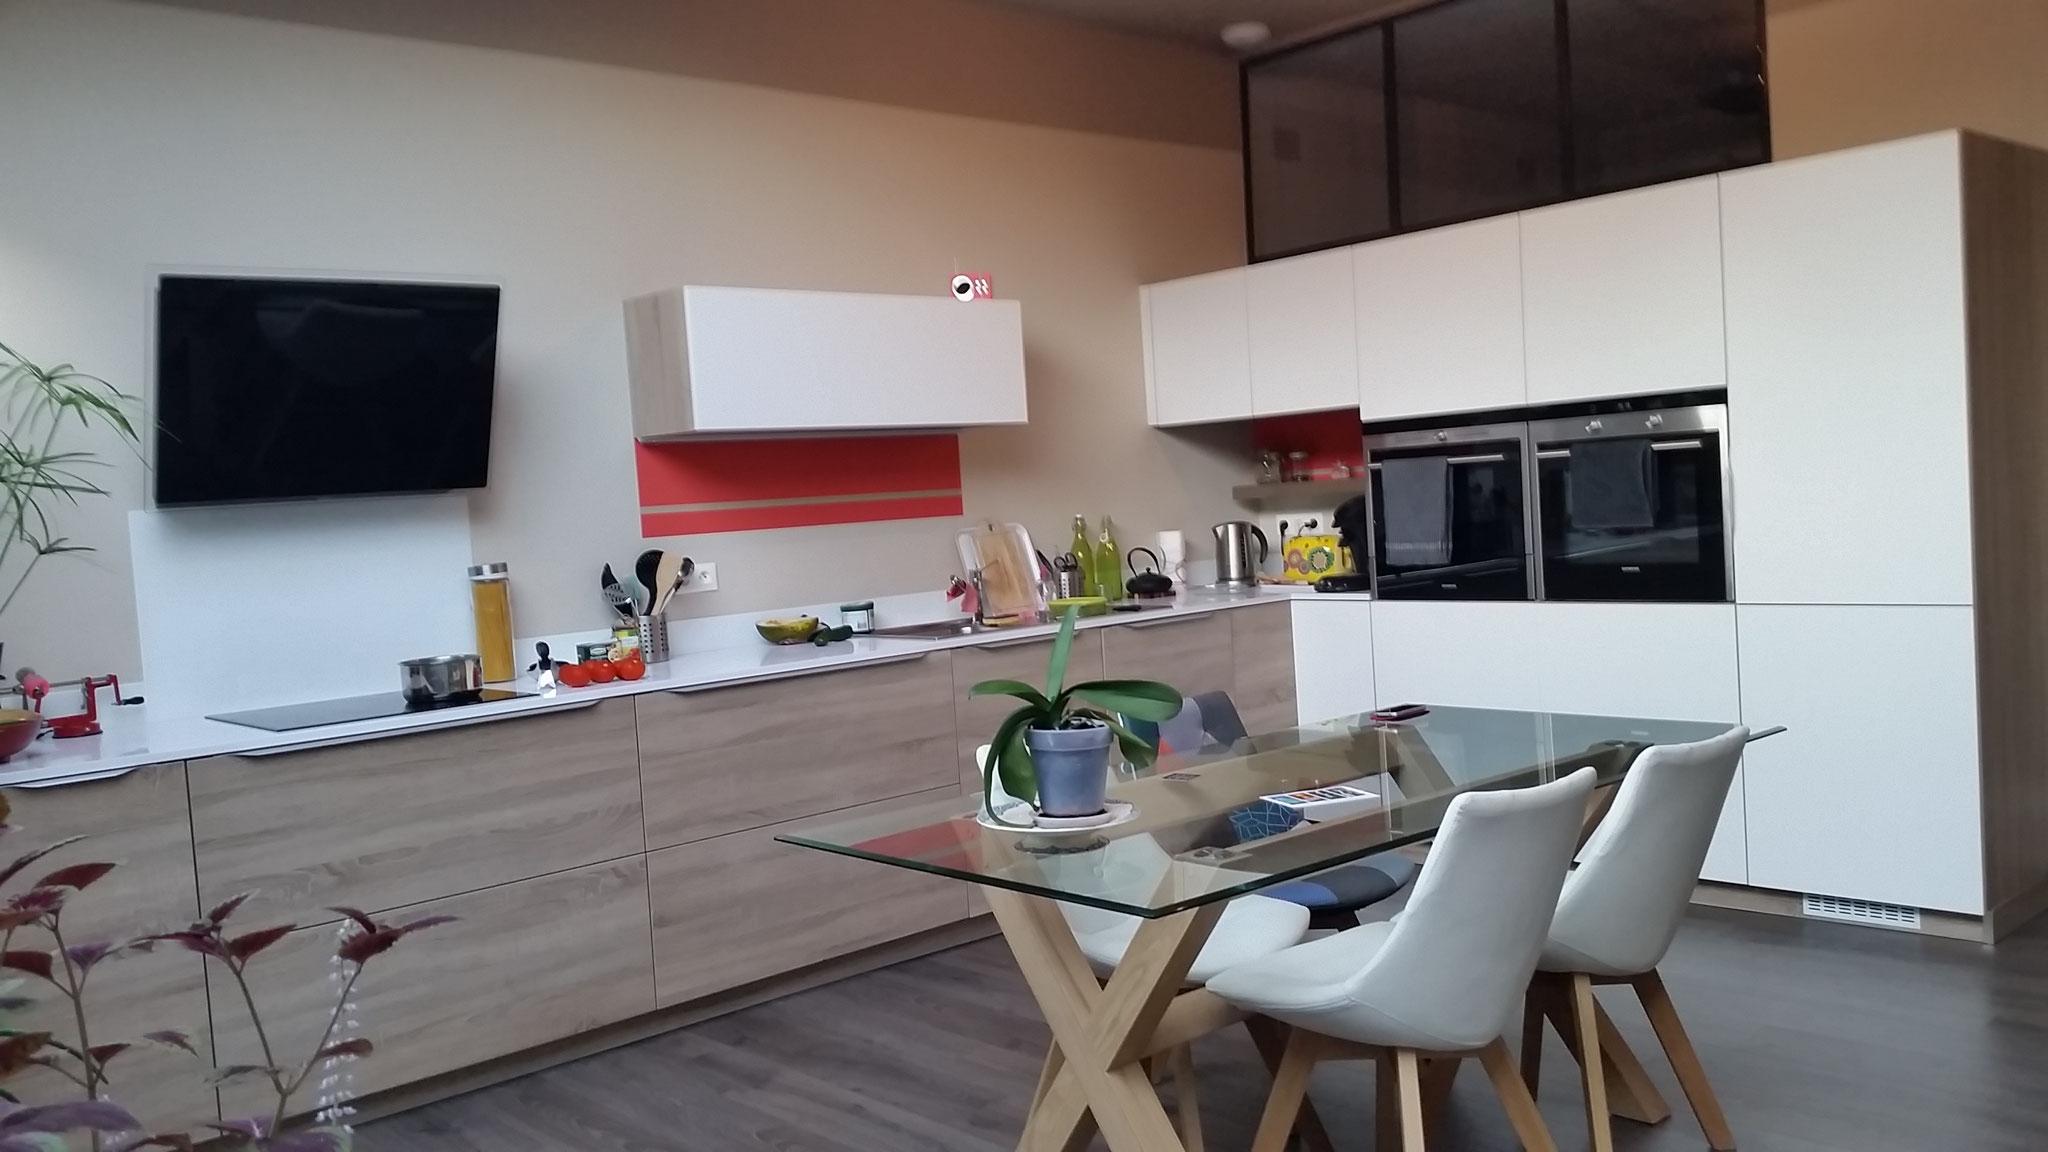 Cuisine formica marron for Cuisine interieur design